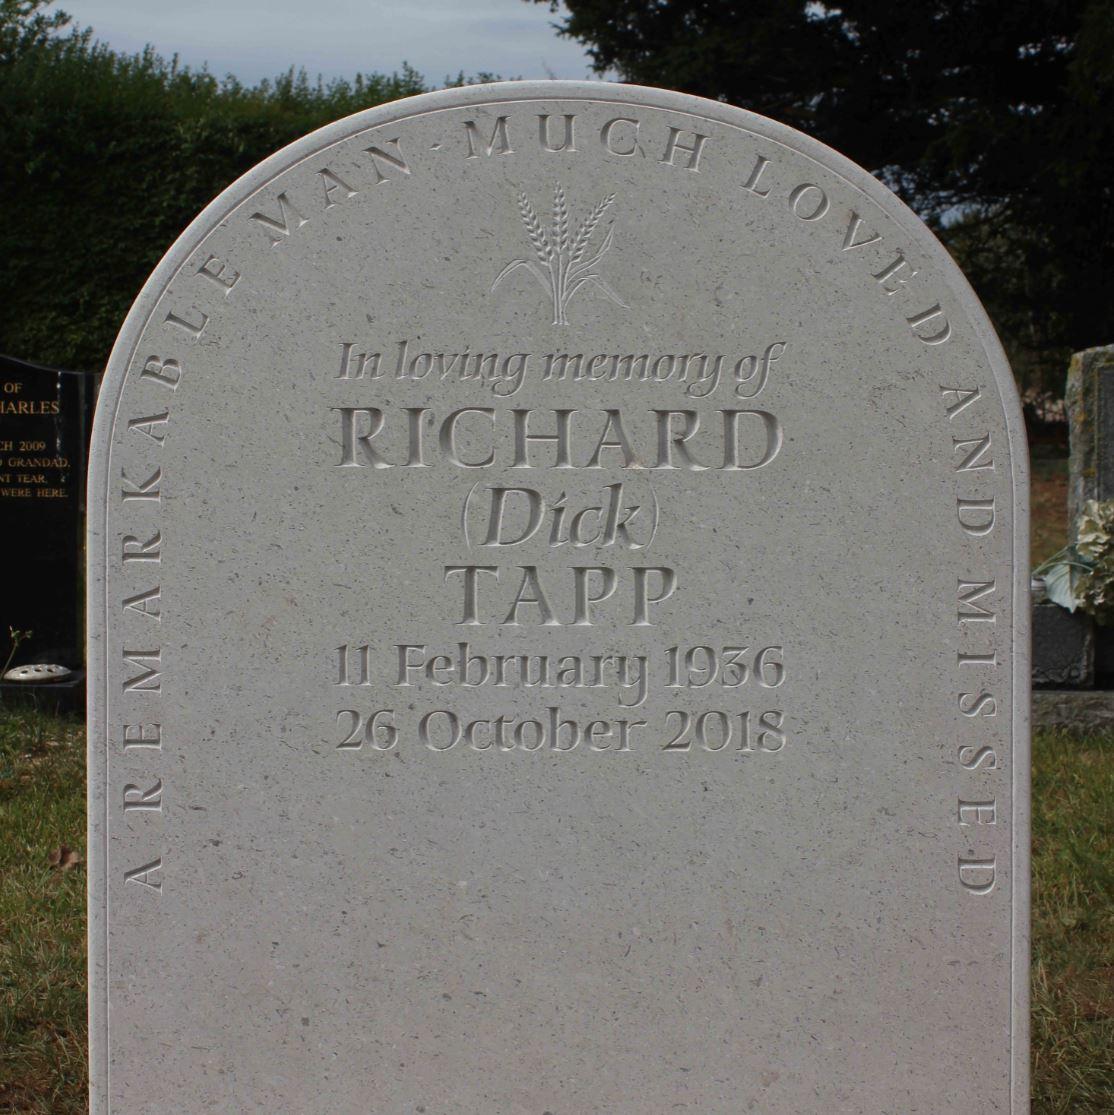 Heartfordshire Grave Stones, Gravestones and Headstones and Memorials